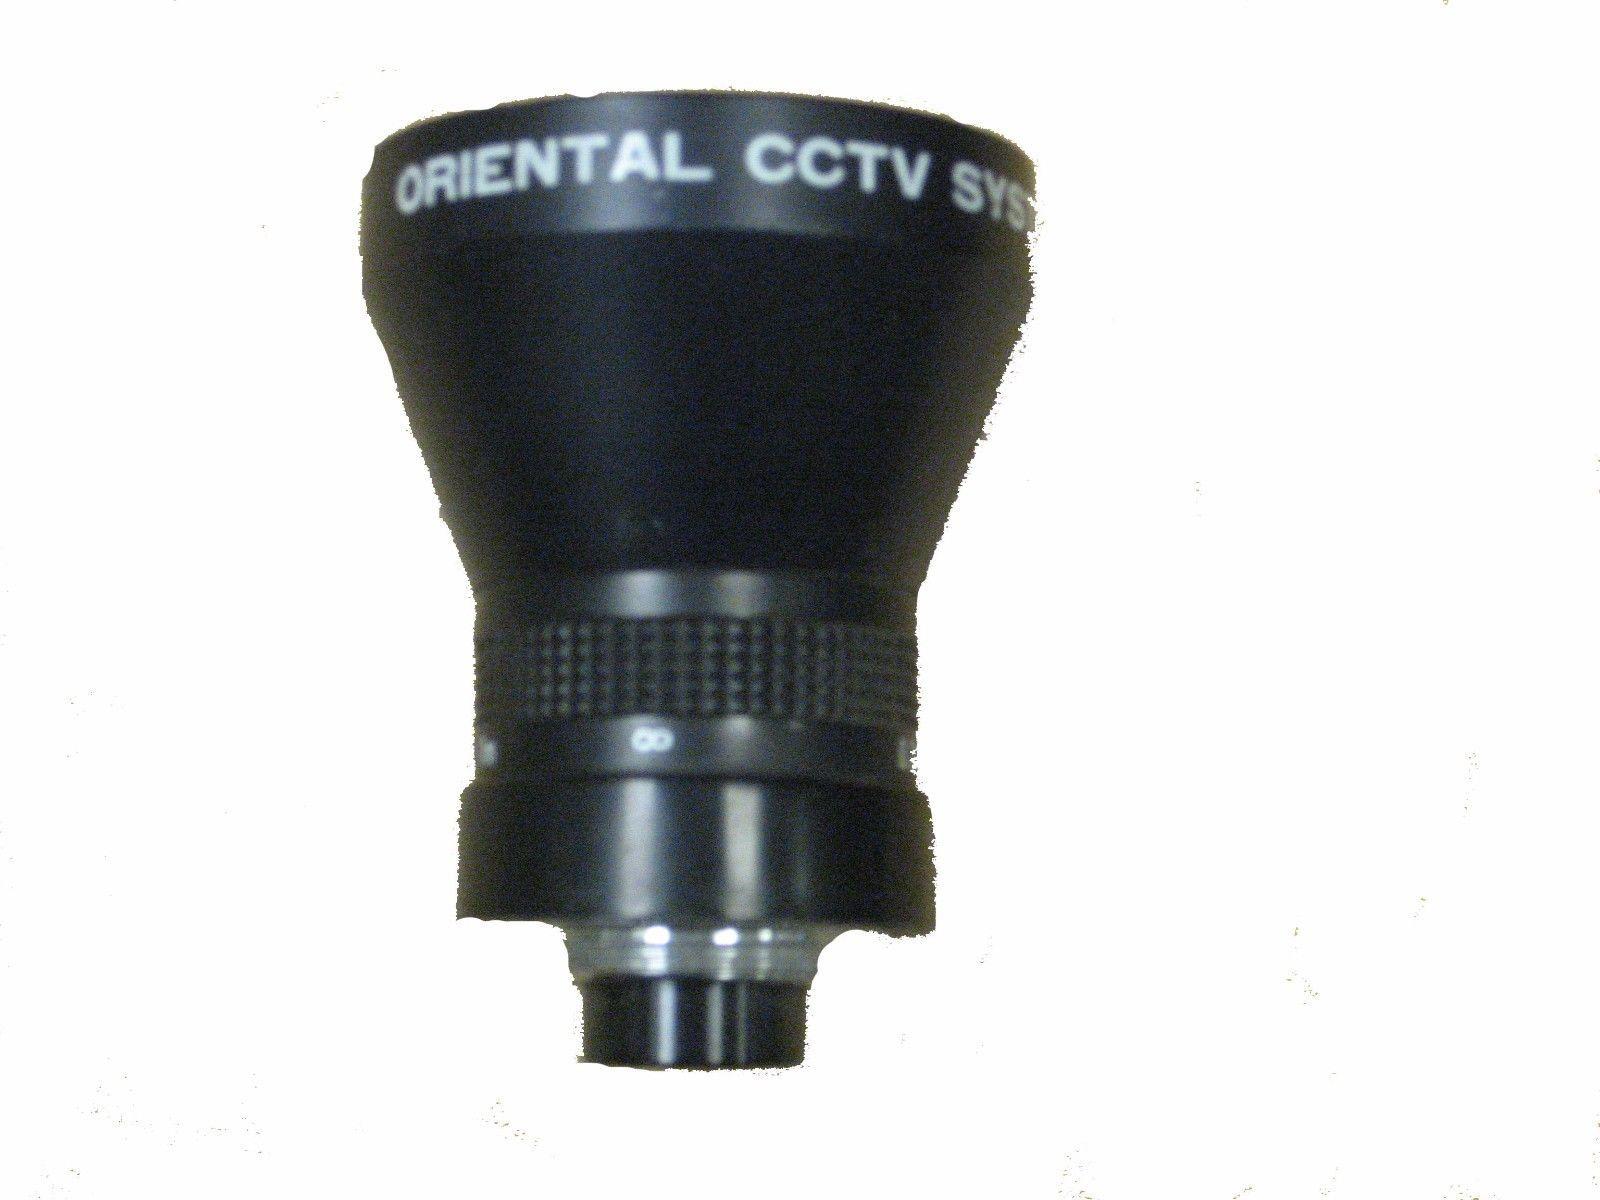 70 Degrees Wide Angle Attachment Camera Lens